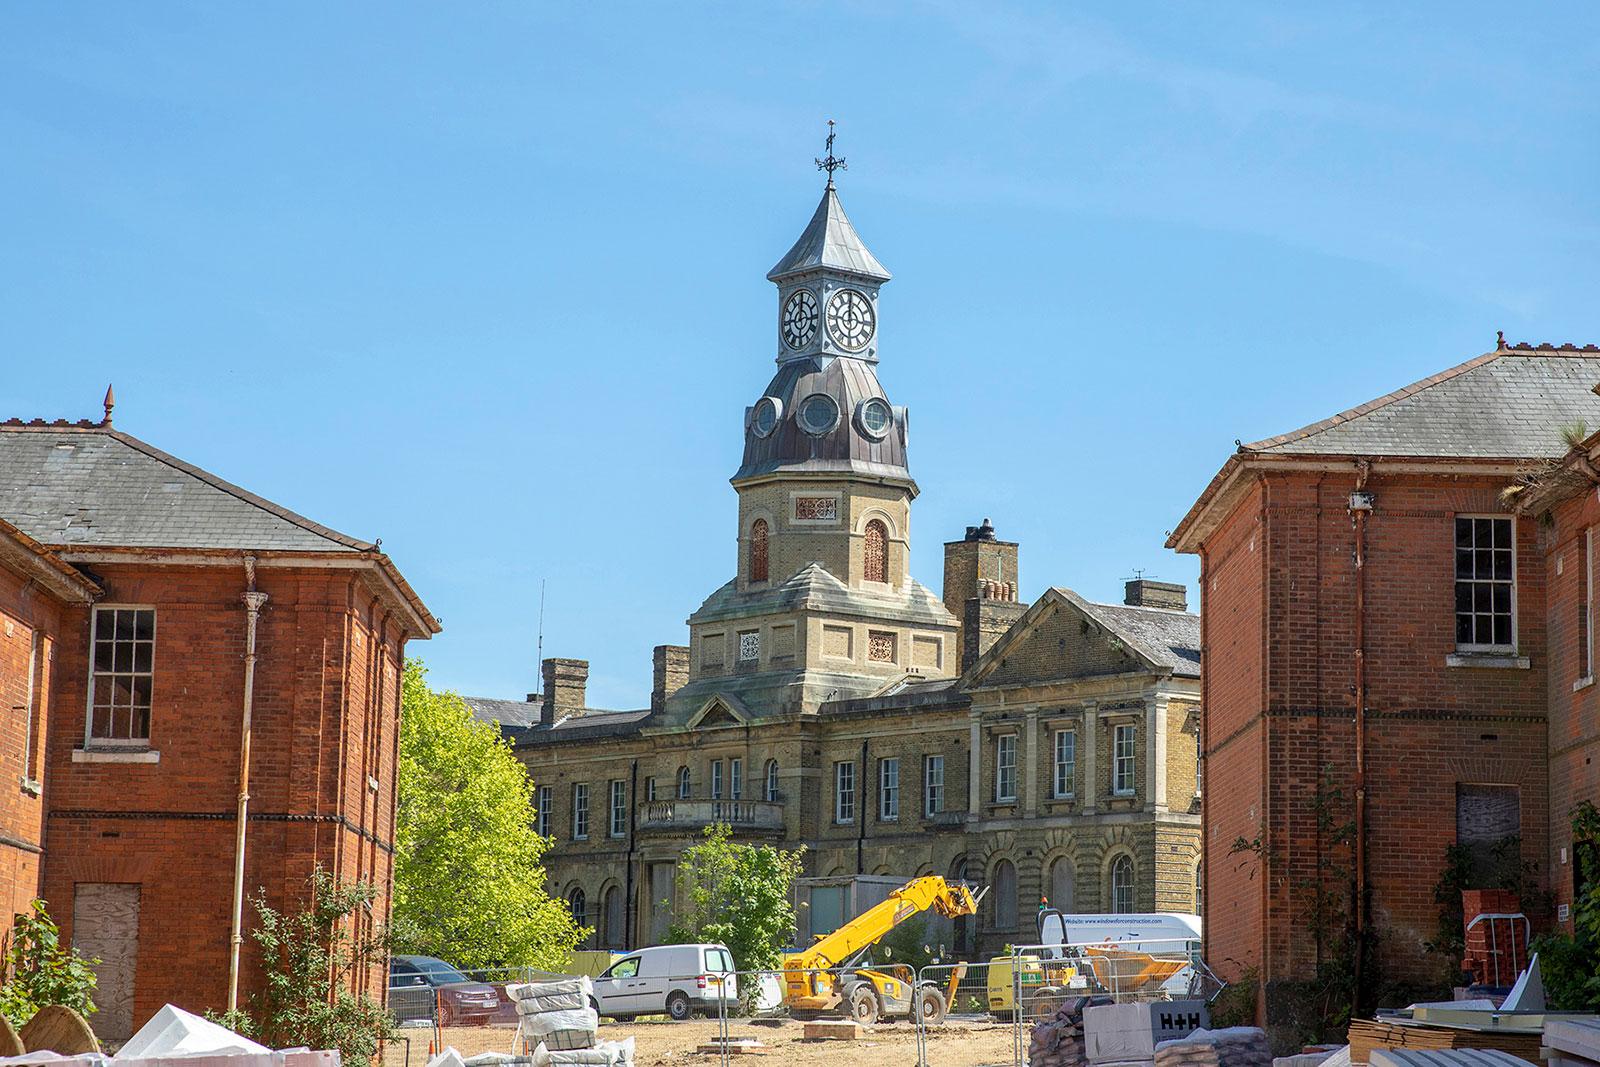 Cambridge Military Hospital construction work